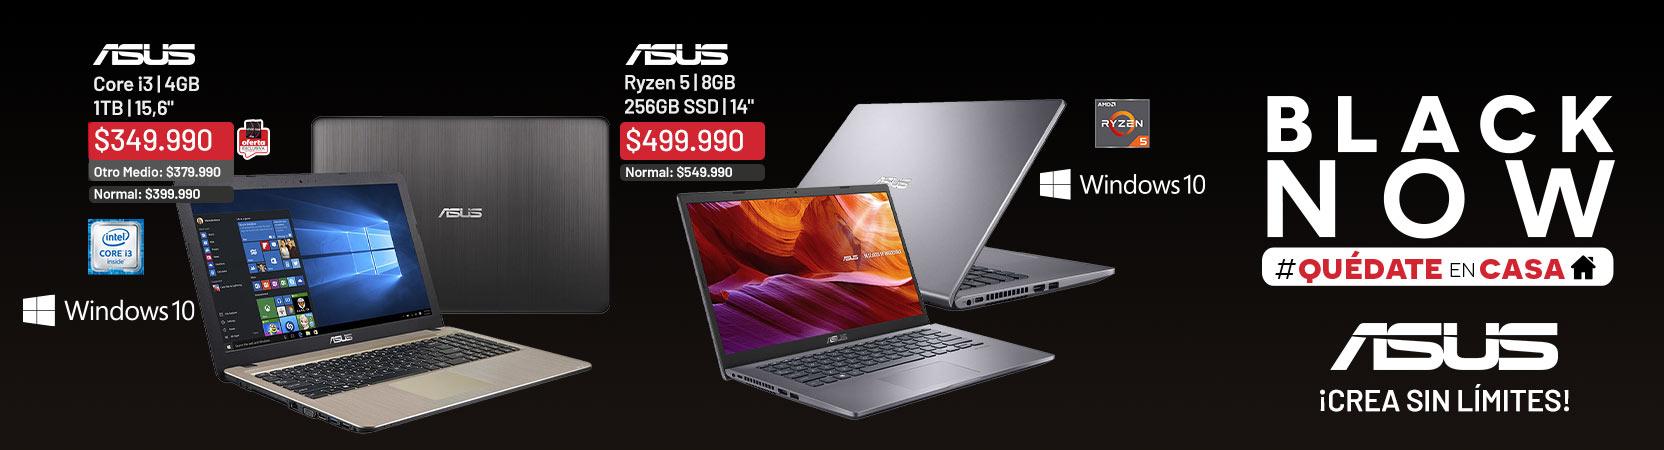 logo Asus | ¡Crea sin límites! | Notebook X540UA-GQ3100T Core i3 4GB 1TB 15,6